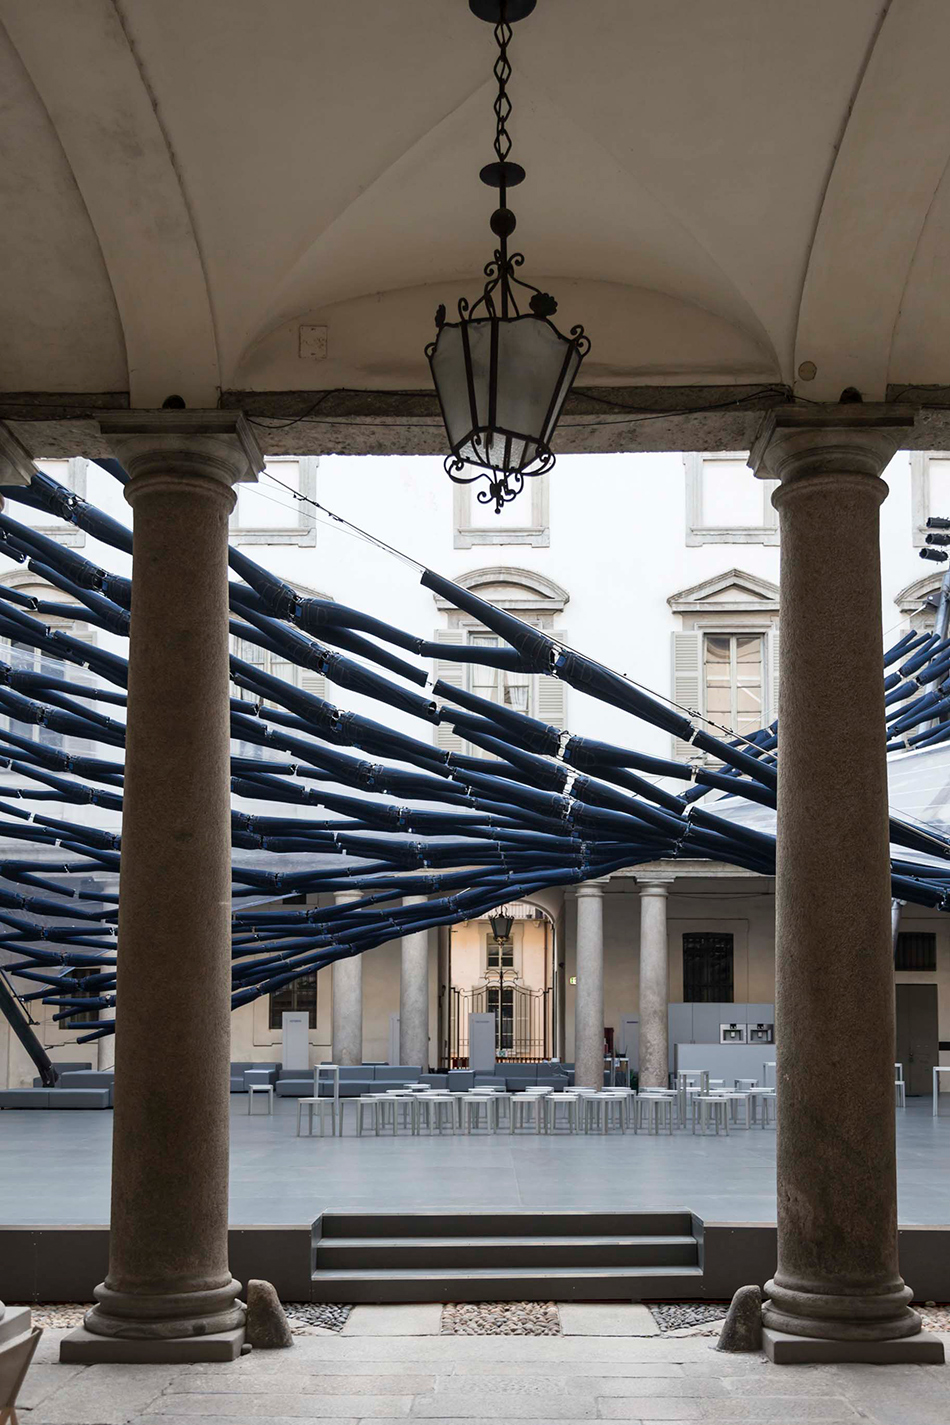 diller scofidio renfro off the cuff jean canopy palazzo litta milan design week designboom 03